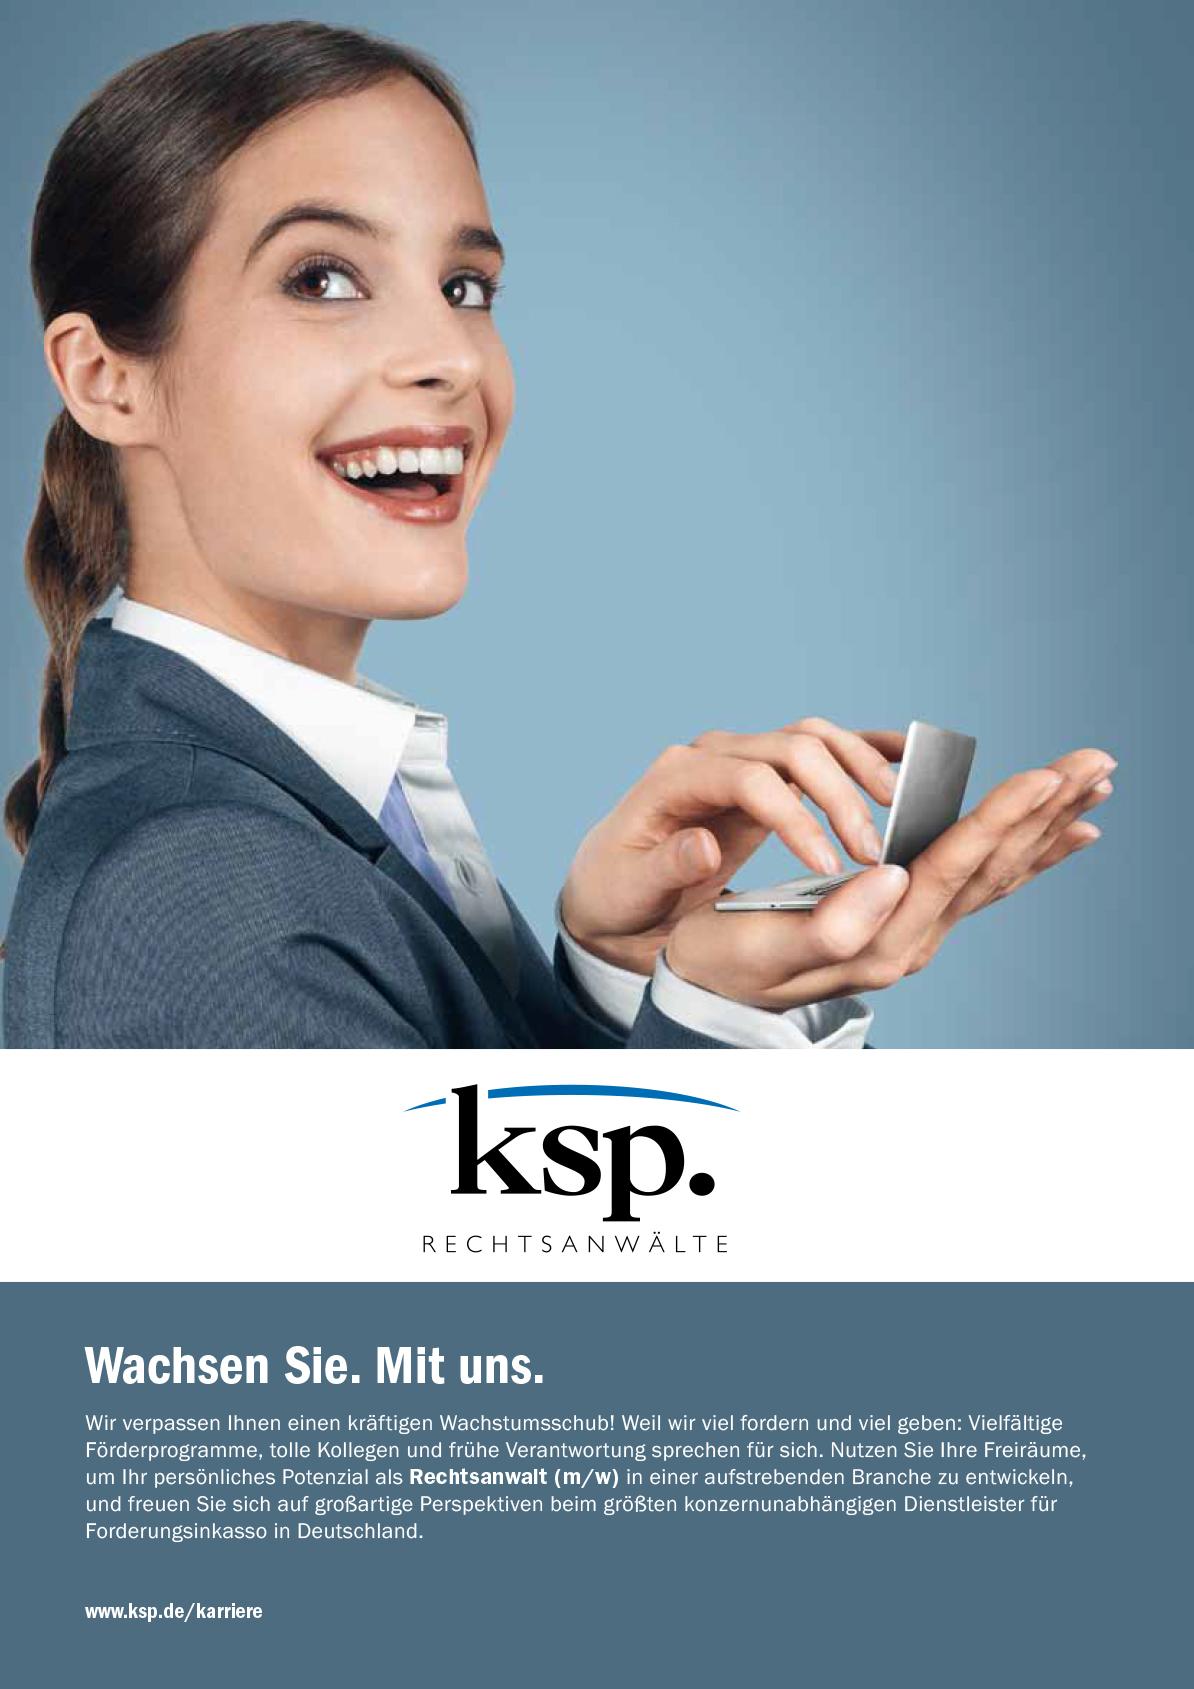 KSP_4